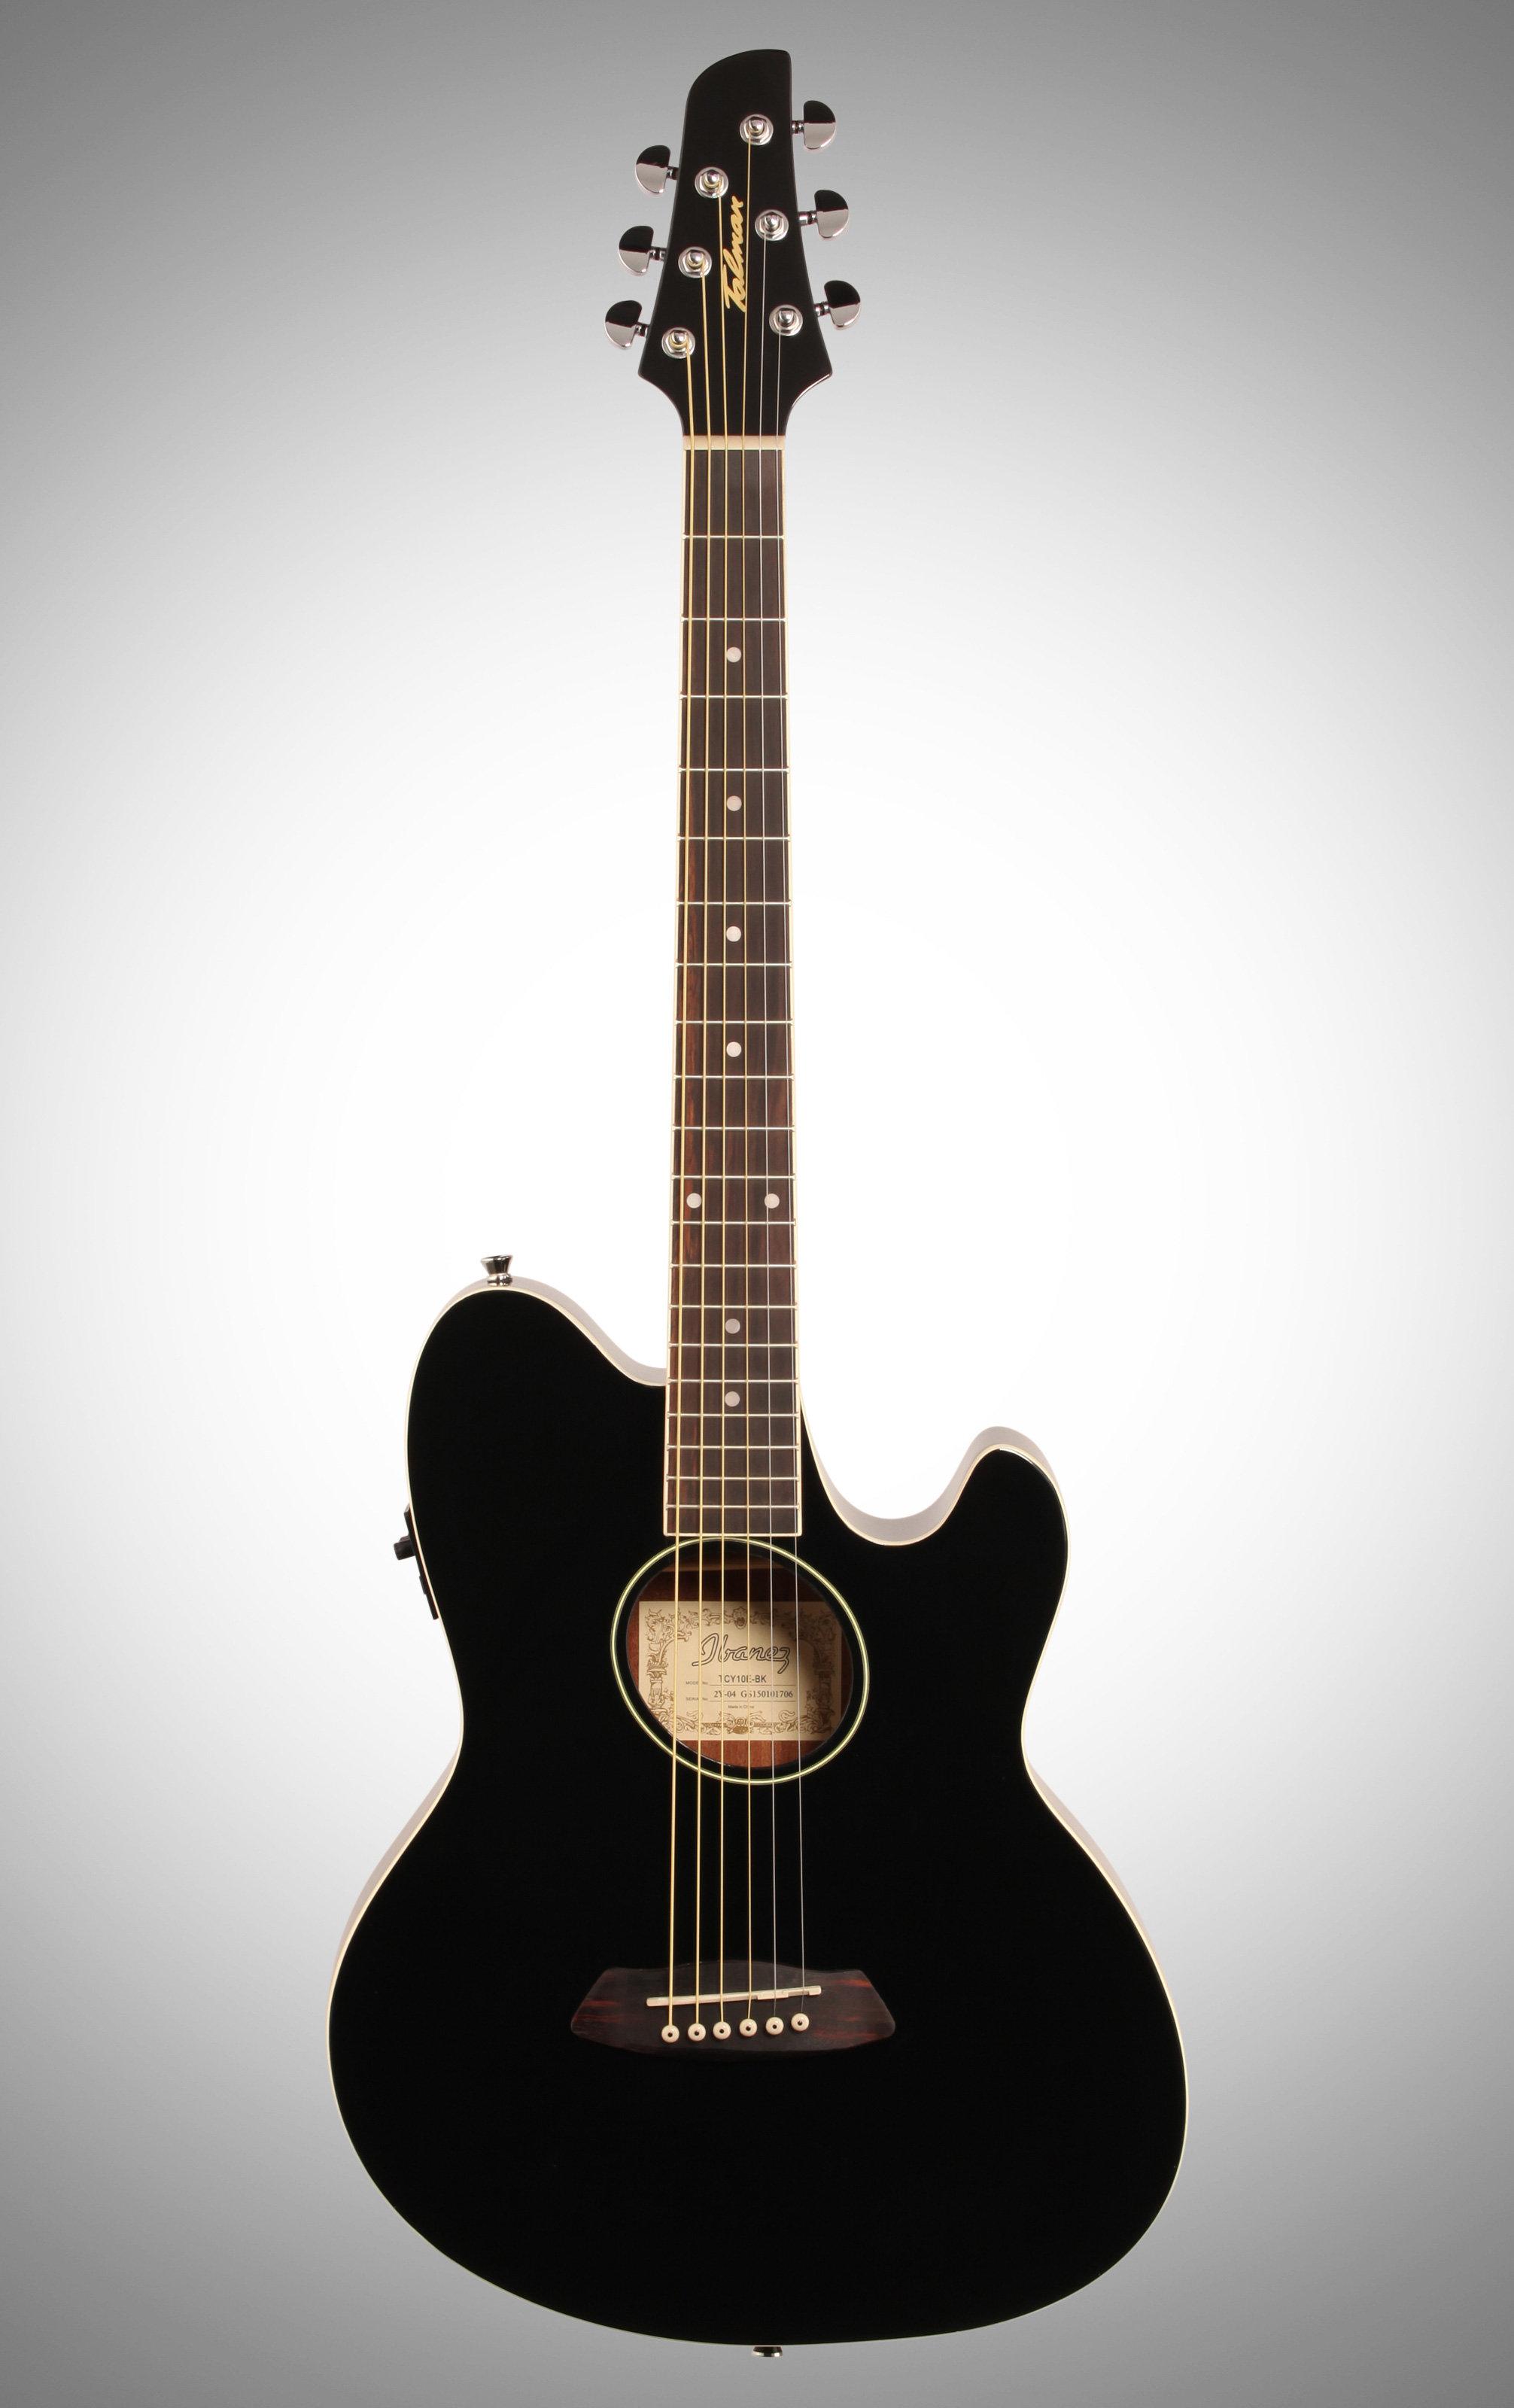 Ibanez Tcy10e Talman Cutaway Acoustic Electric Guitar Black